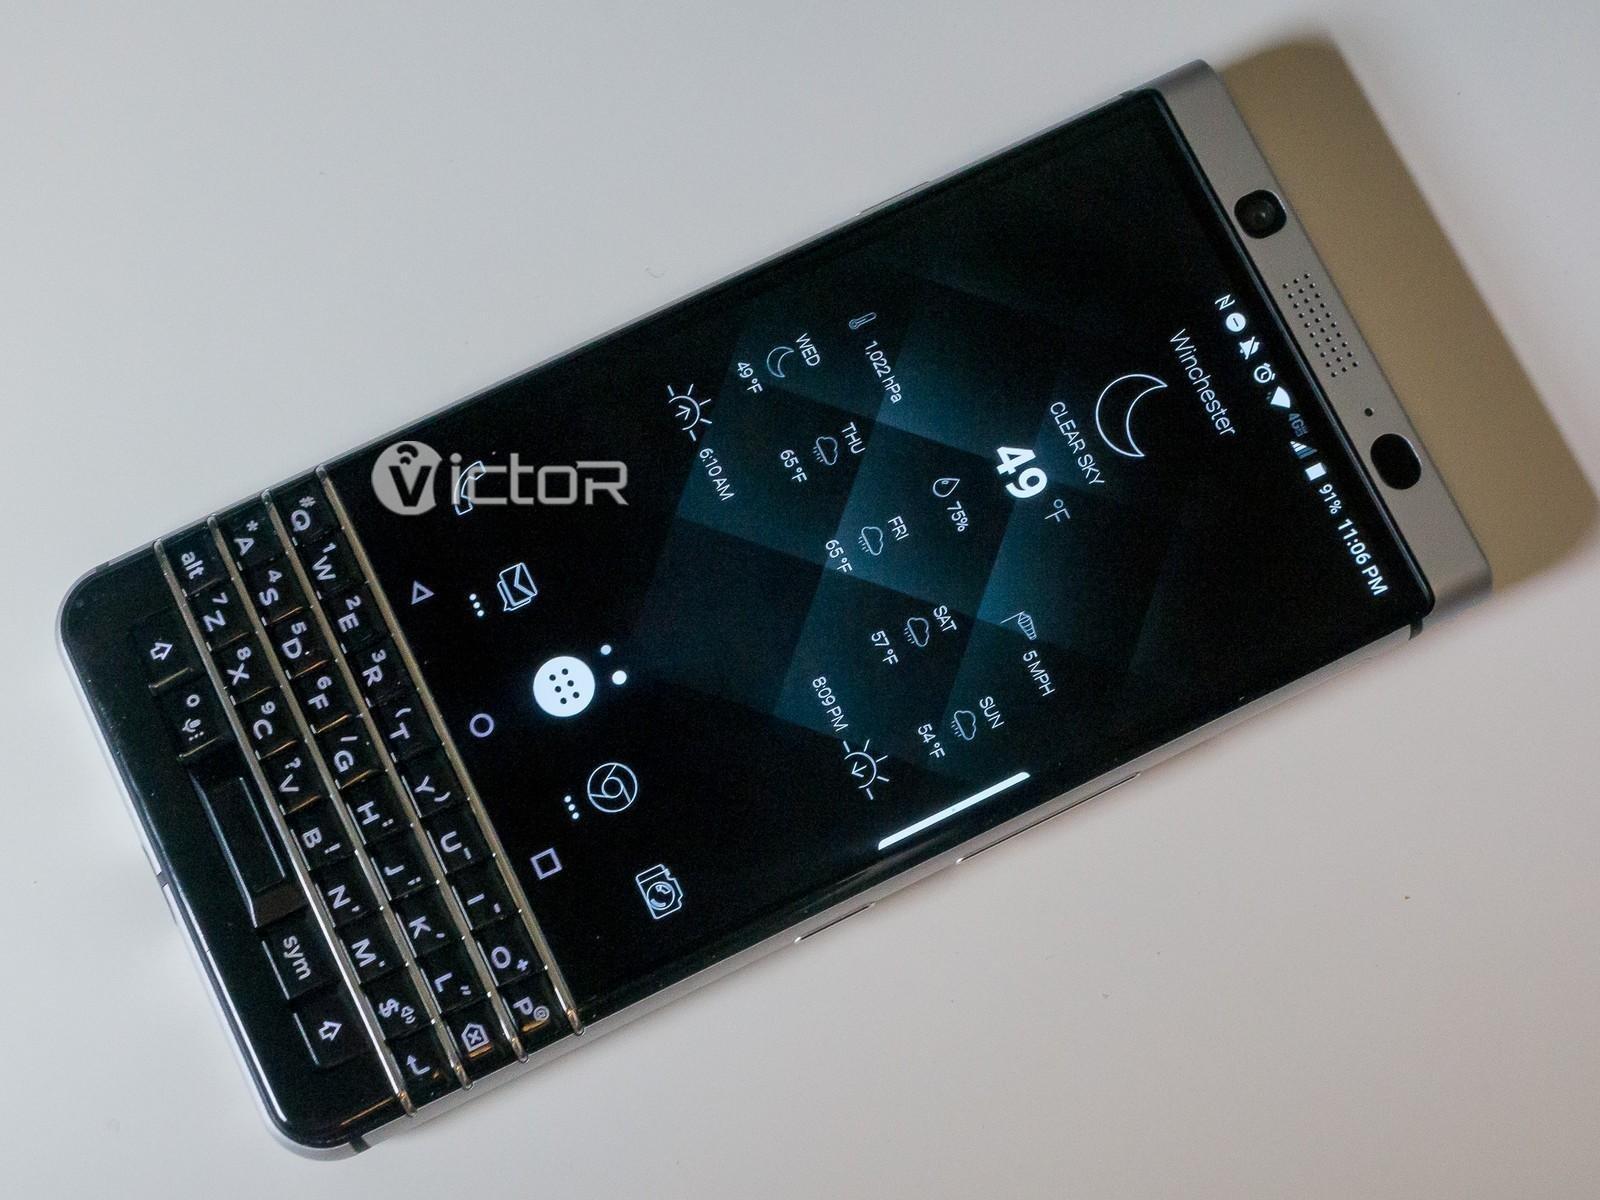 blackberry keyone - blackberry smartphone - keyboard smartphone - 3